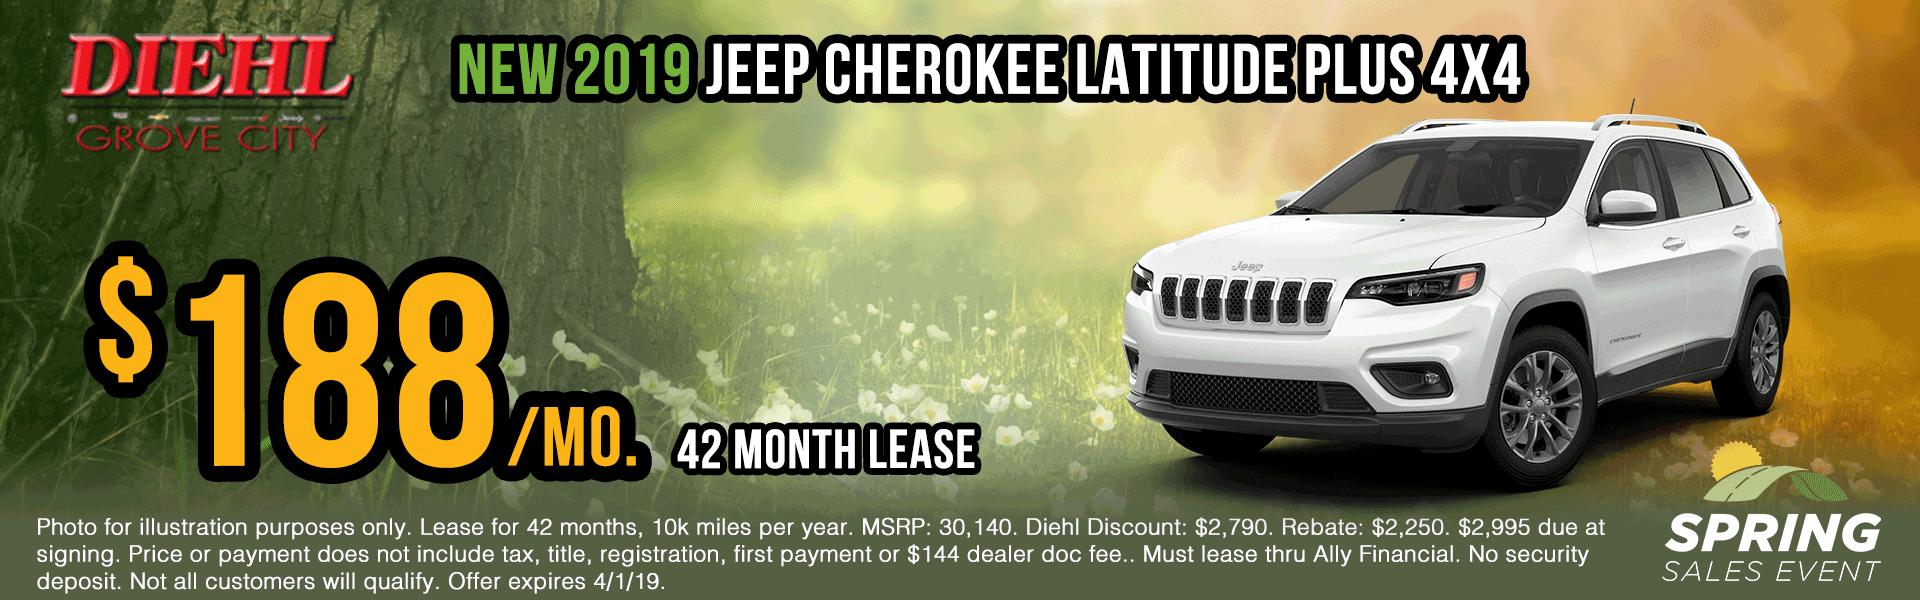 J1379-2019-jeep-cherokee-latitude-plus Spring sales event jeep specials Chrysler specials ram specials dodge specials mopar specials new vehicle specials Diehl automotive Diehl Robinson Diehl of grove city specials lease specials